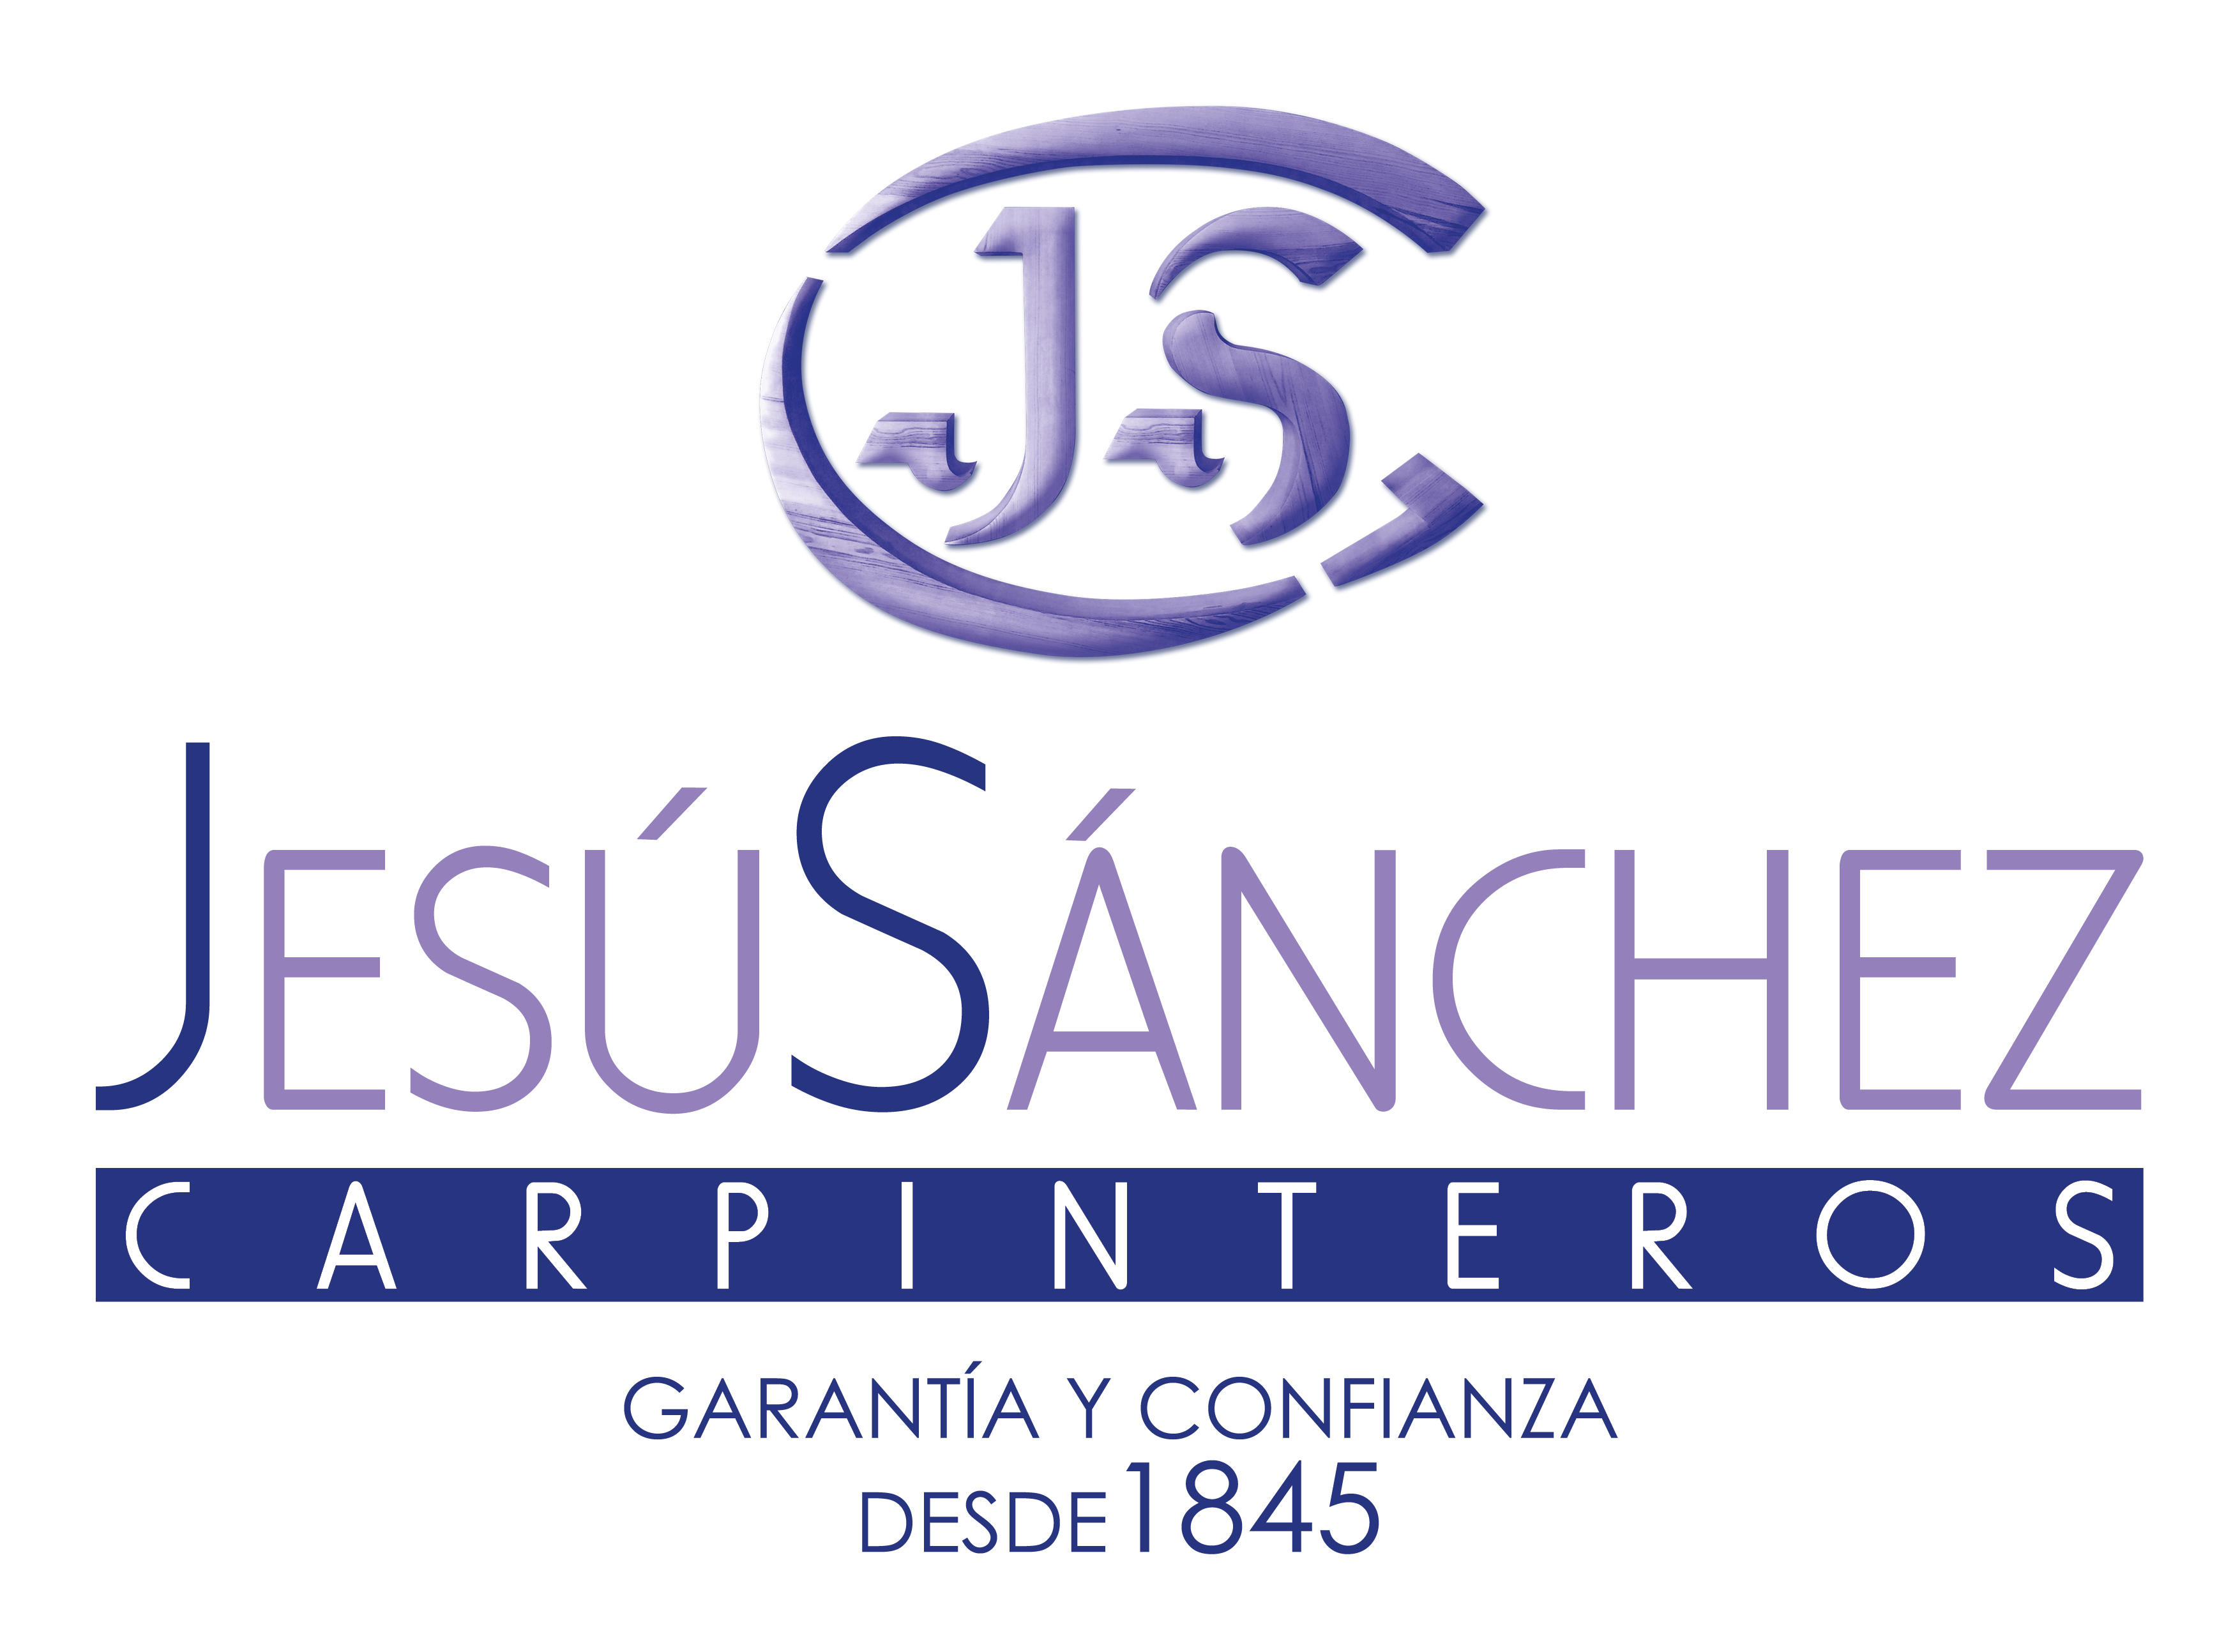 Jesús Sánchez Carpinteros S.l.